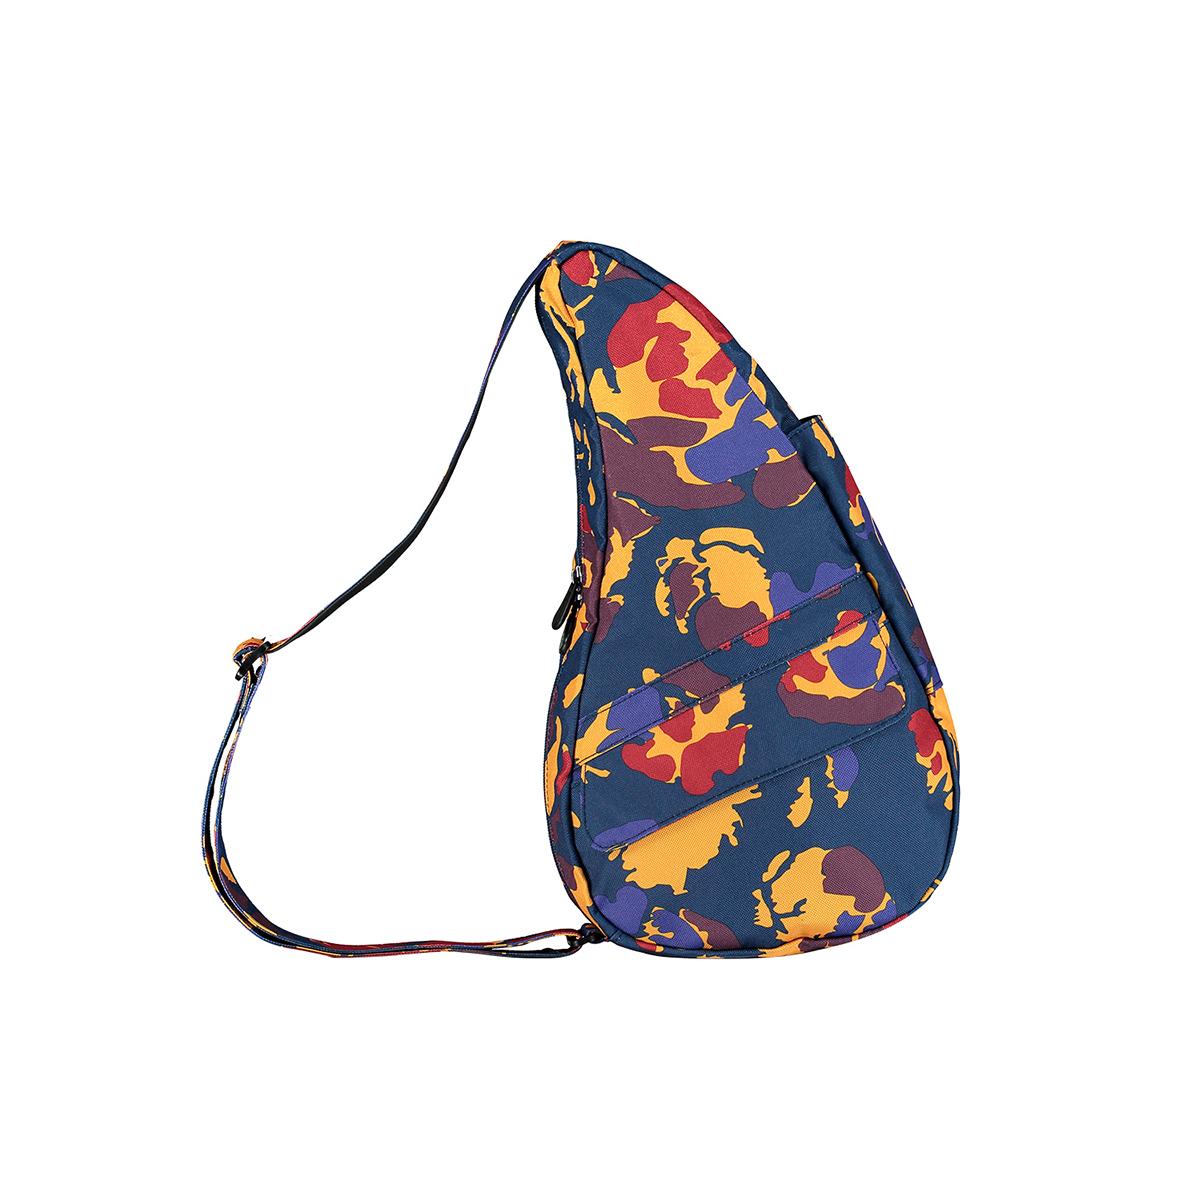 Healthy Back Bag/ヘルシーバックバッグ/ショルダーバッグ/ボディバッグ/旅行バッグ/軽量/レディース/メンズ 公式ストア ヘルシーバックバッグ プリント Sサイズ ミスティックフローラル ネイビー